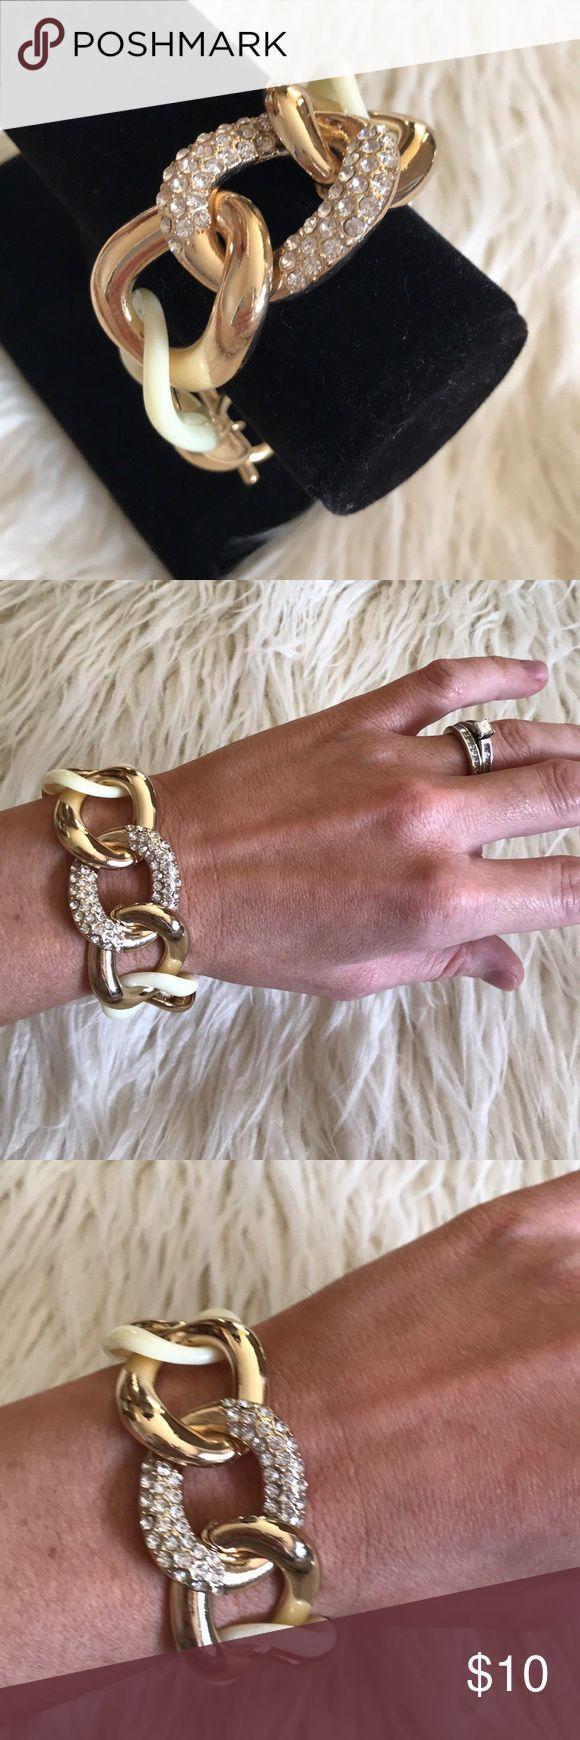 Ivory Rhinestone Chain Link Bracelet Ivory rhinestone chain link bracelet Jewelry Bracelets